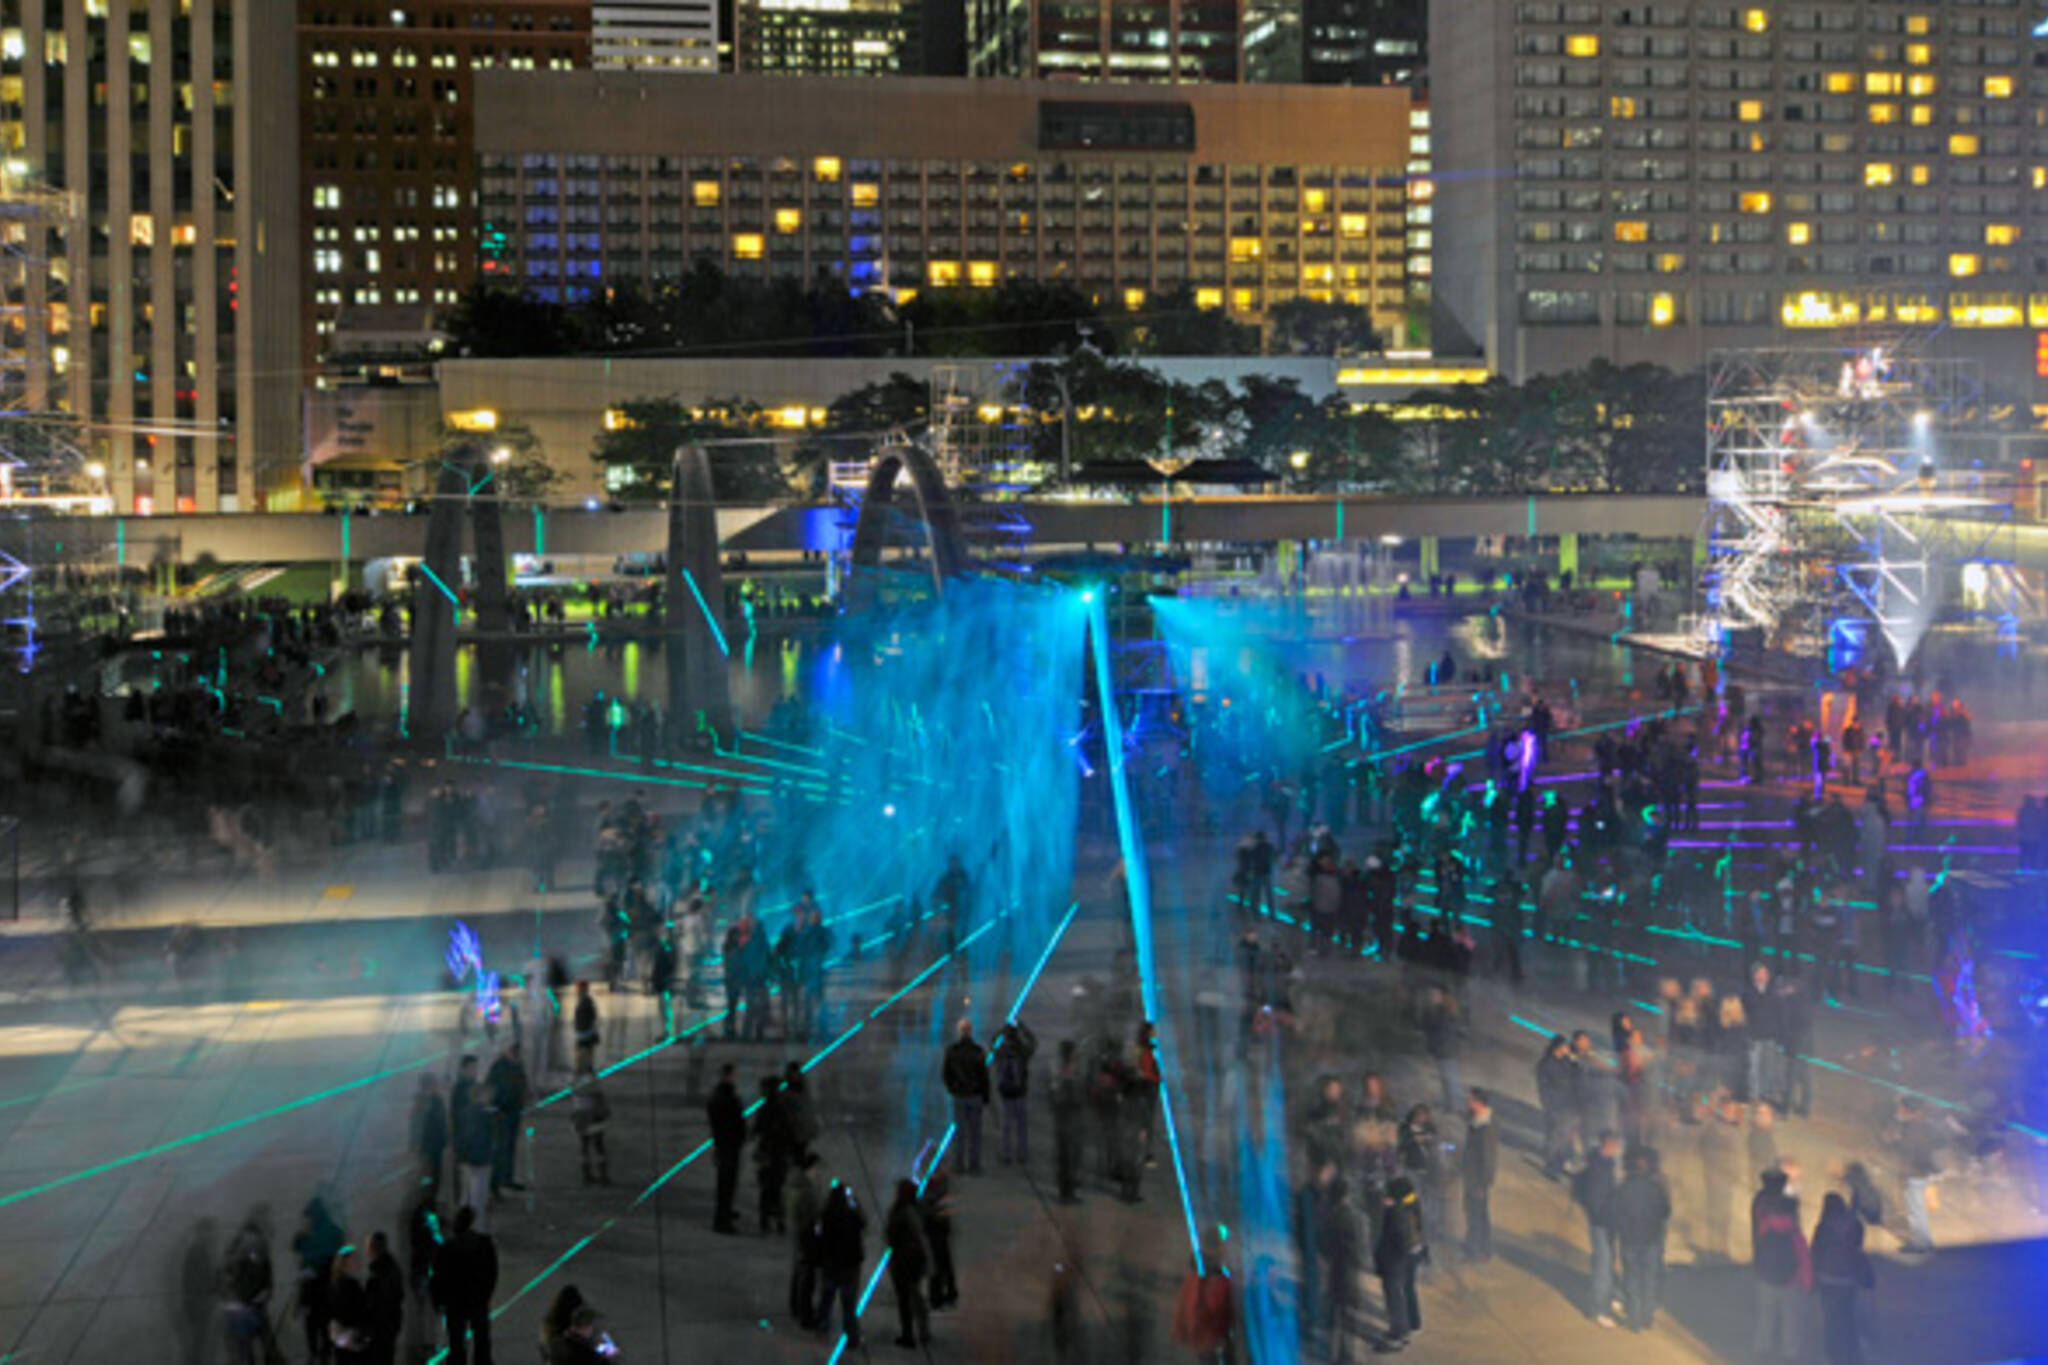 Nuit Blanche Festival